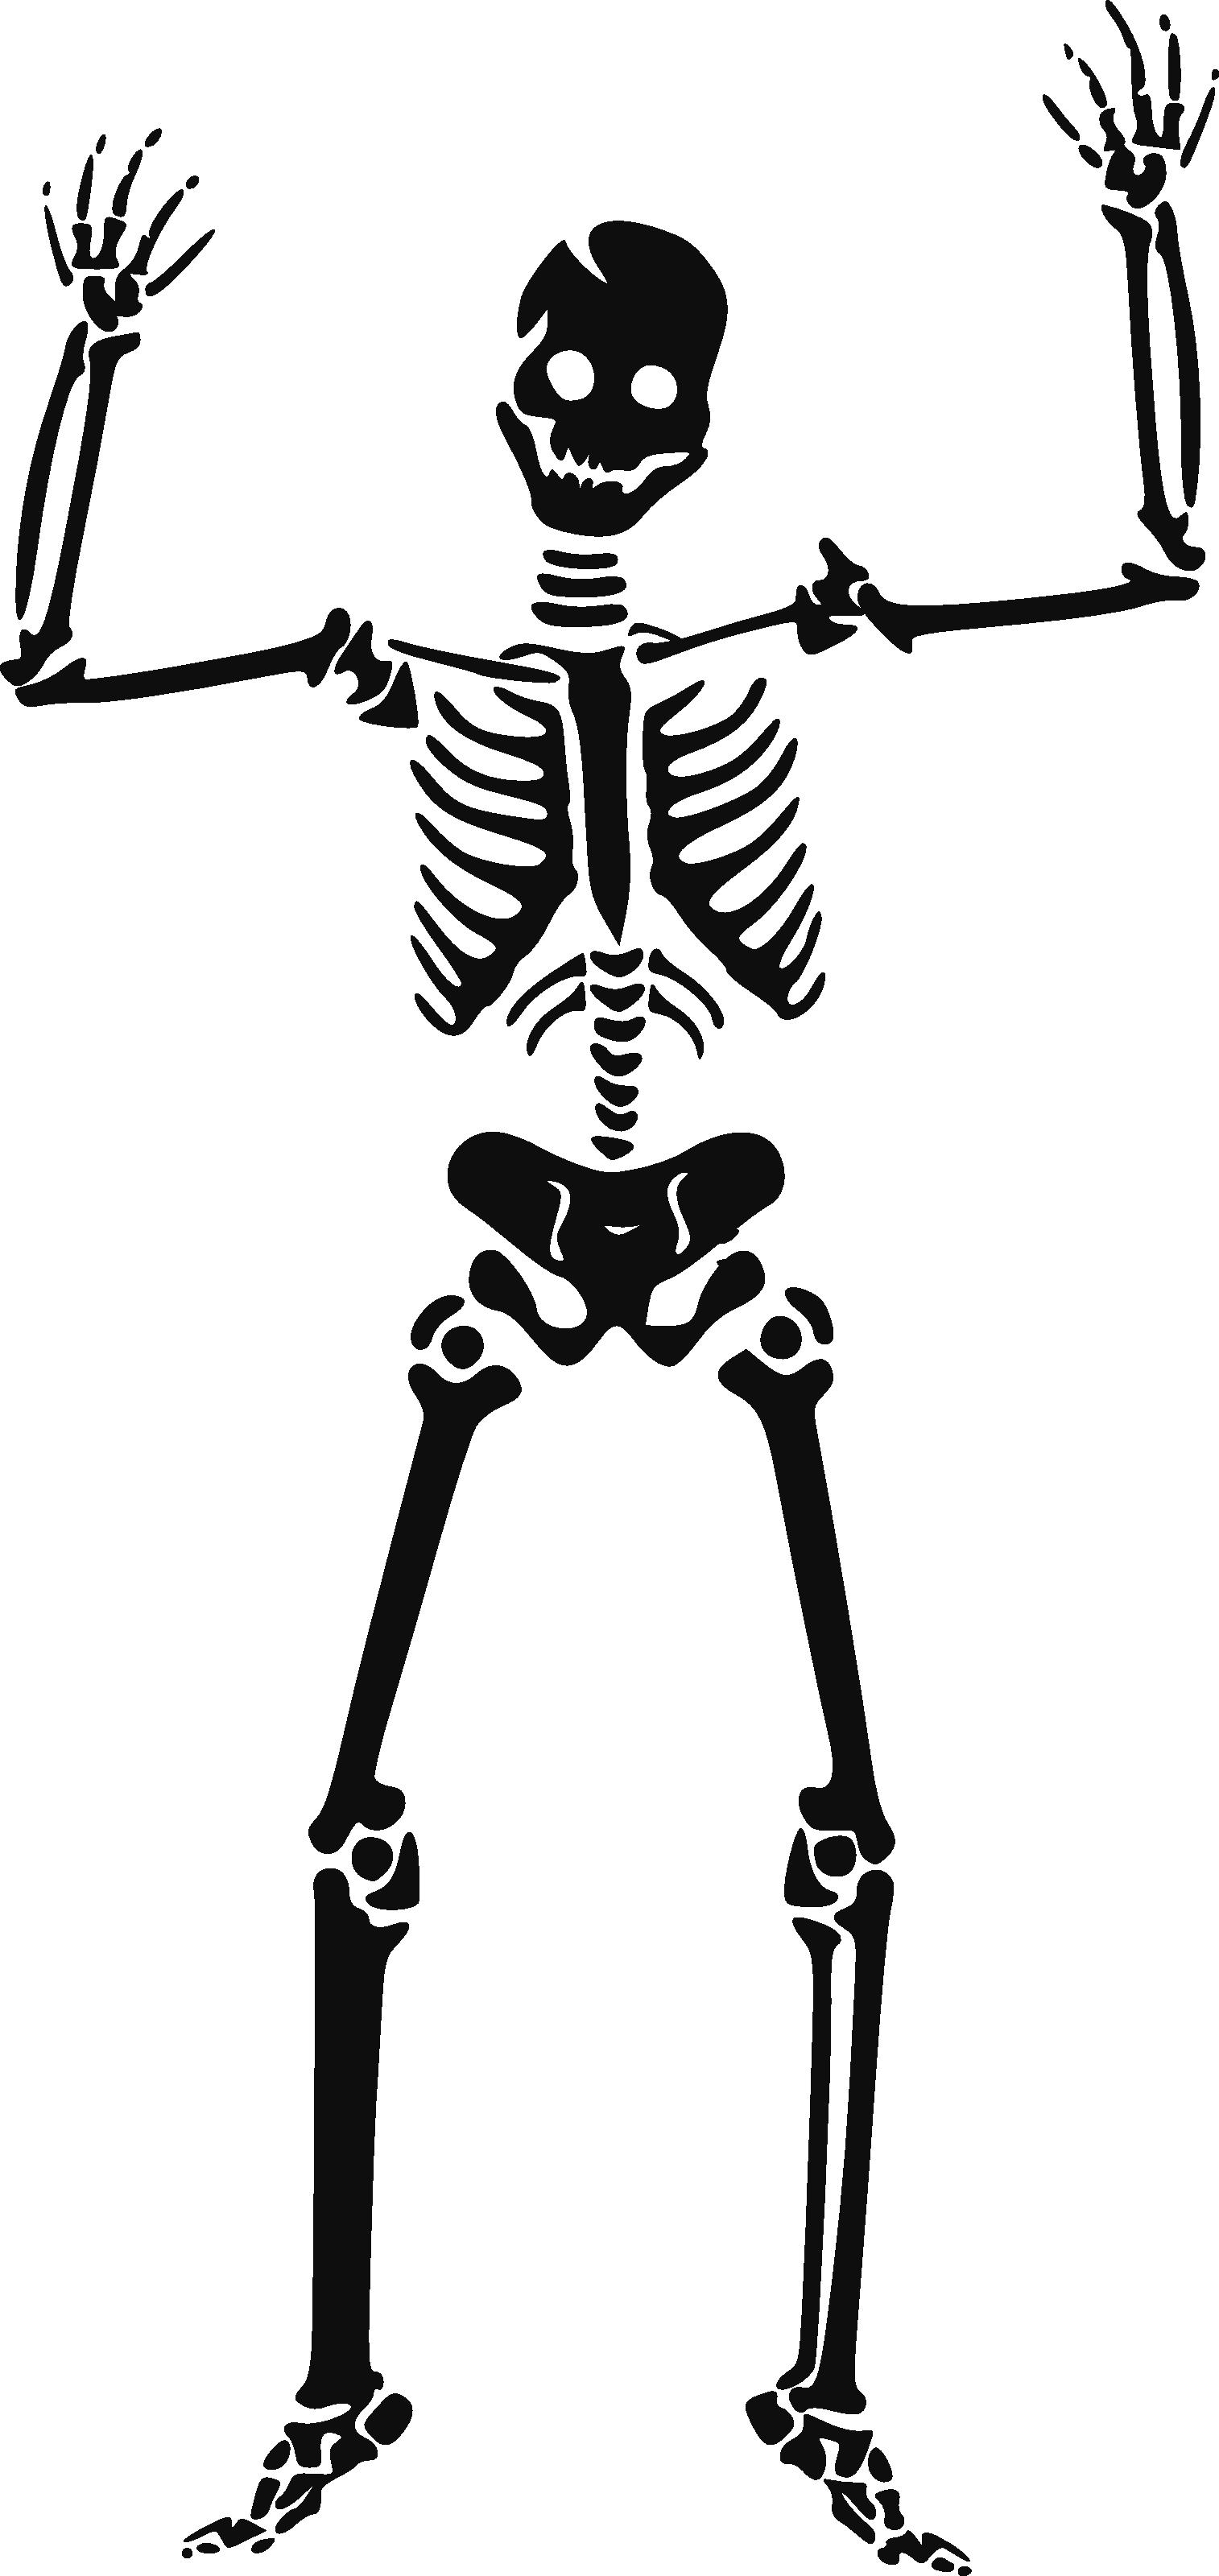 Public domain famine google. Clipart halloween black and white